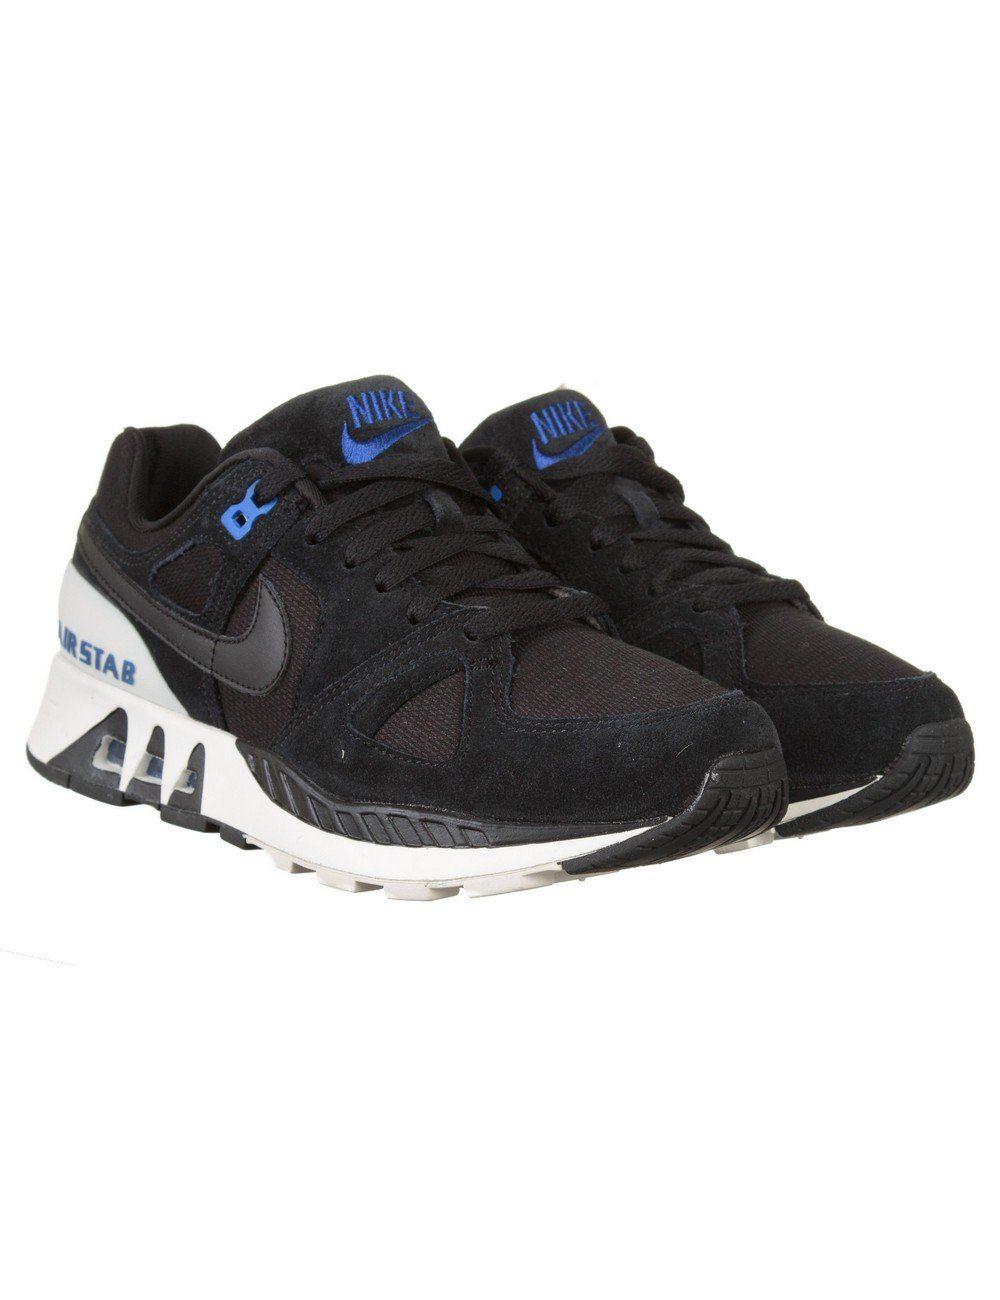 80449ad911 Black Shoes · Fashion · Trainers · Nike Tennis ·  http://www.fatbuddhastore.com/footwear-c10/trainers-